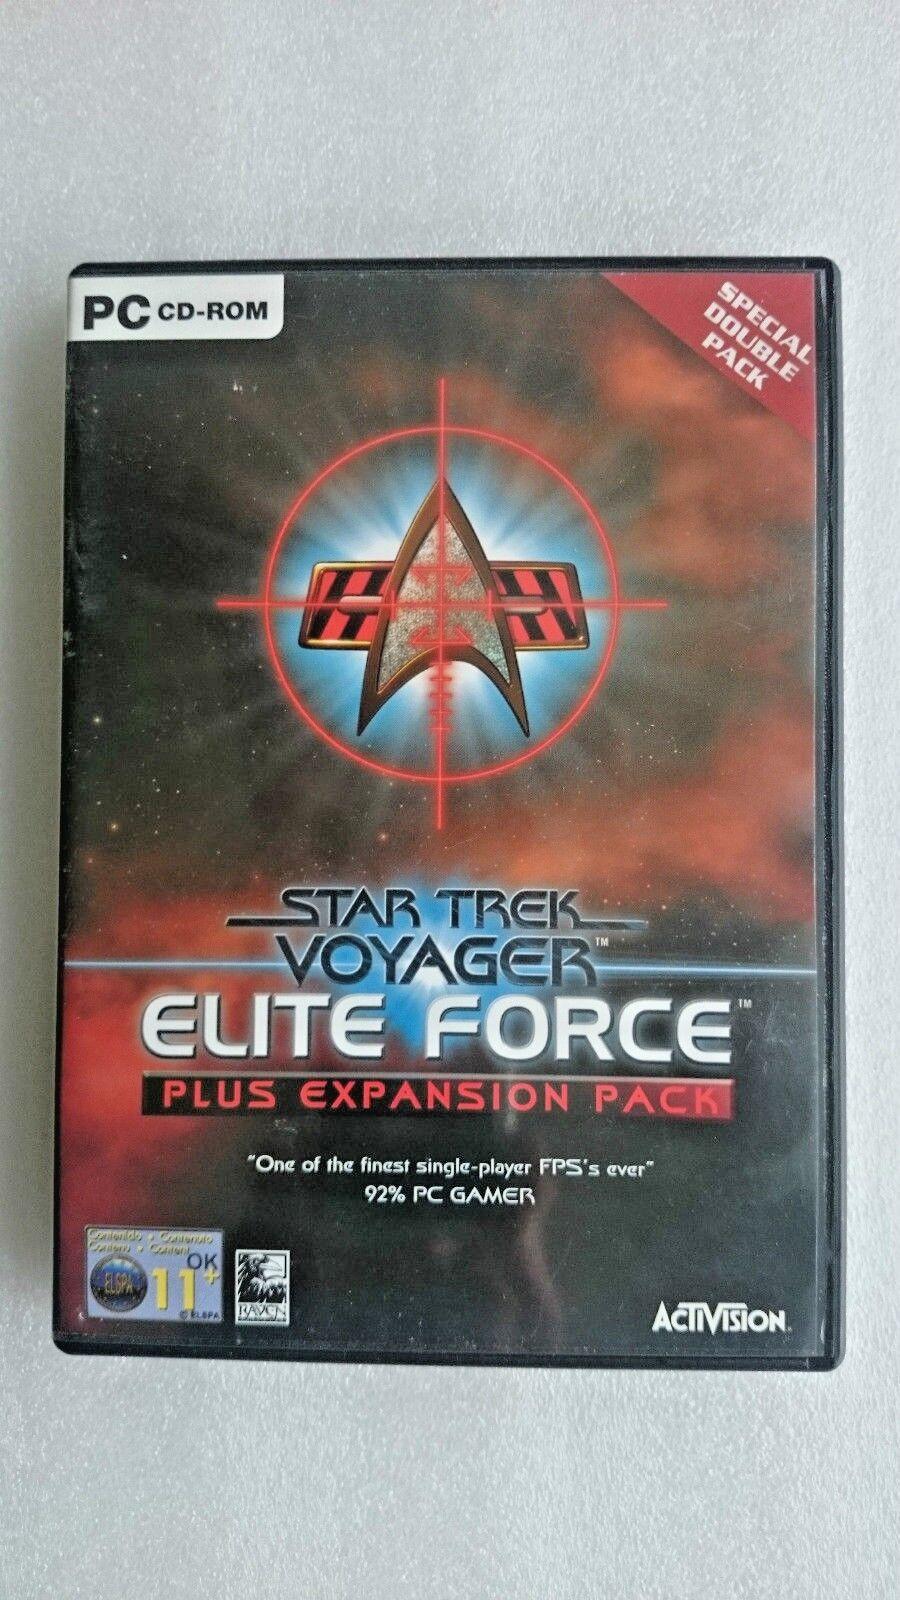 Star Trek Voyager - Elite Force  PC Plus Expansion Pack - Original Release